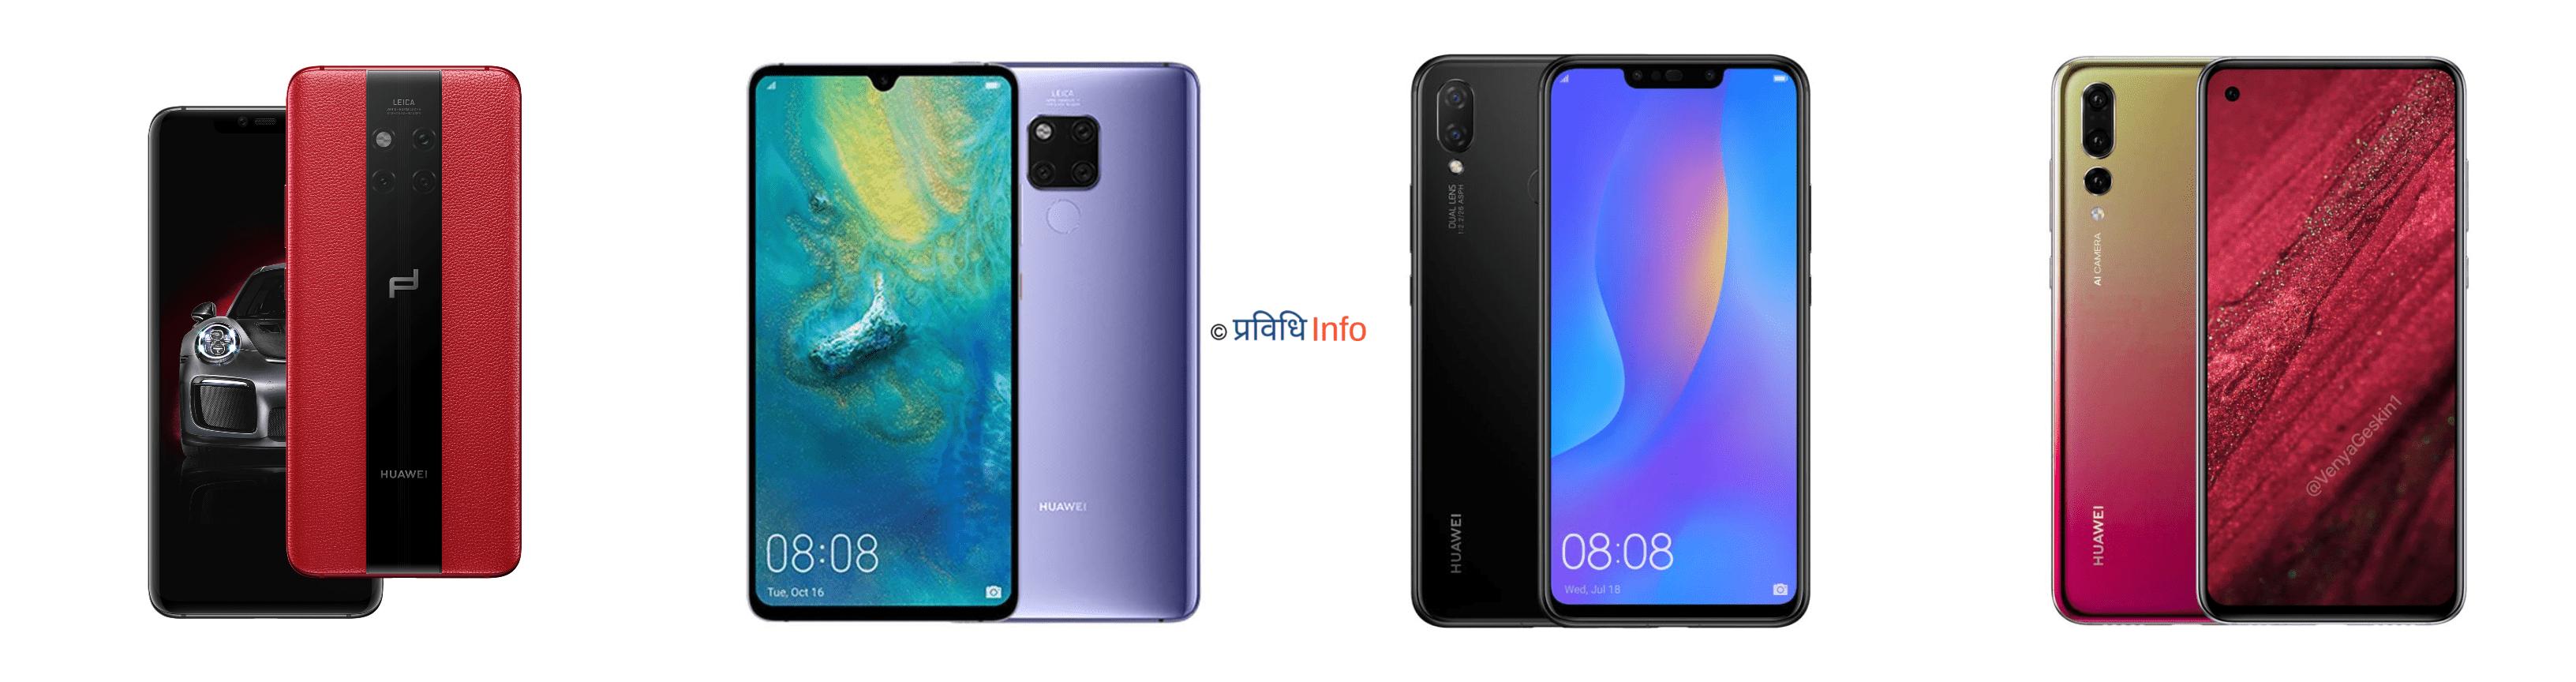 Huawei Mobile Price 2019